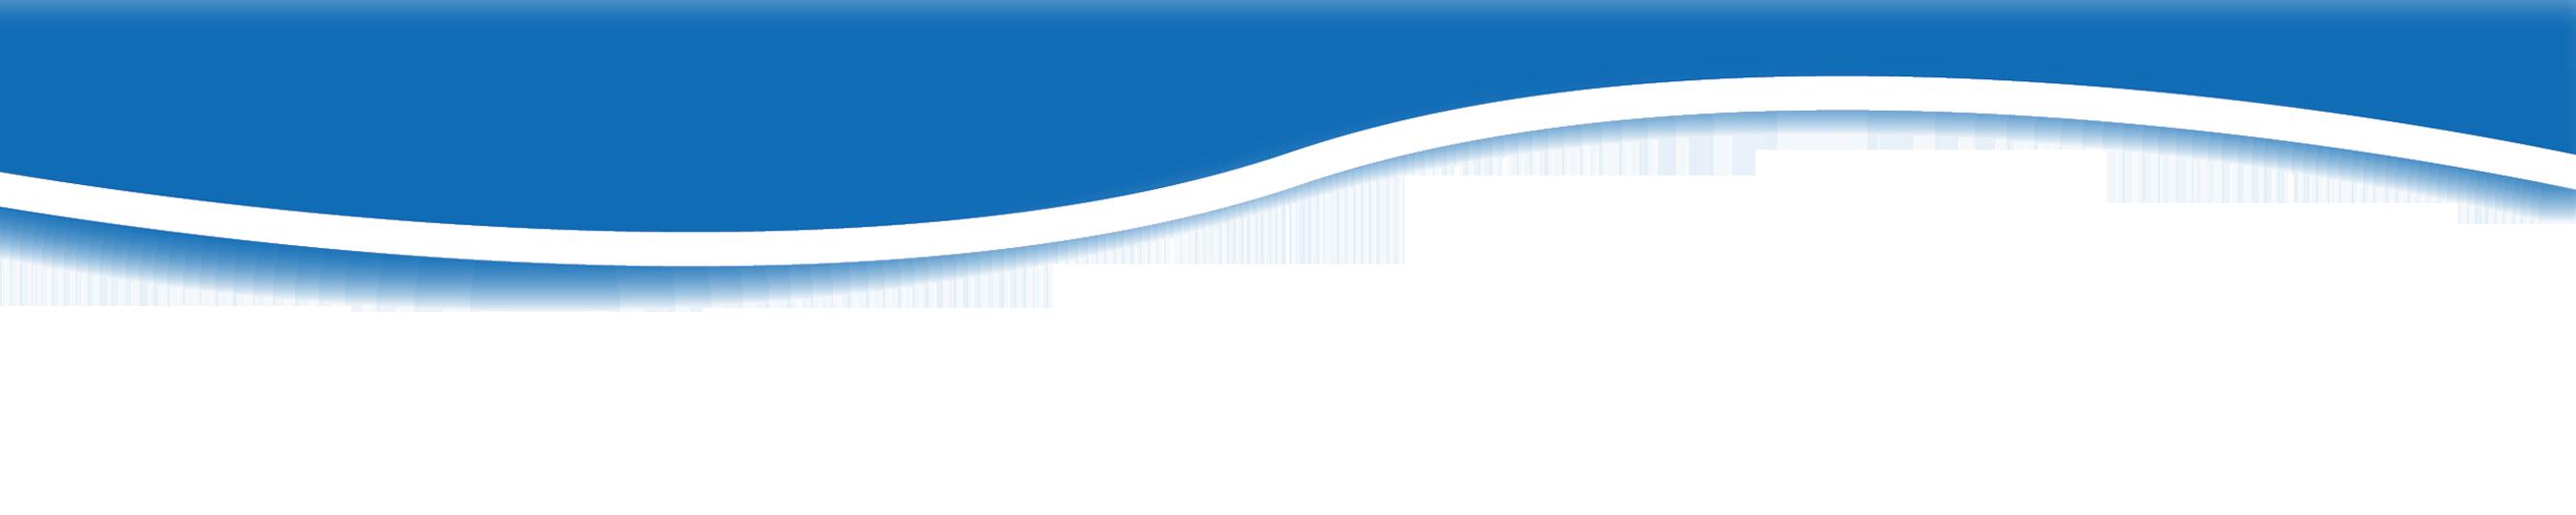 Top header olympus insurance. Wave border png